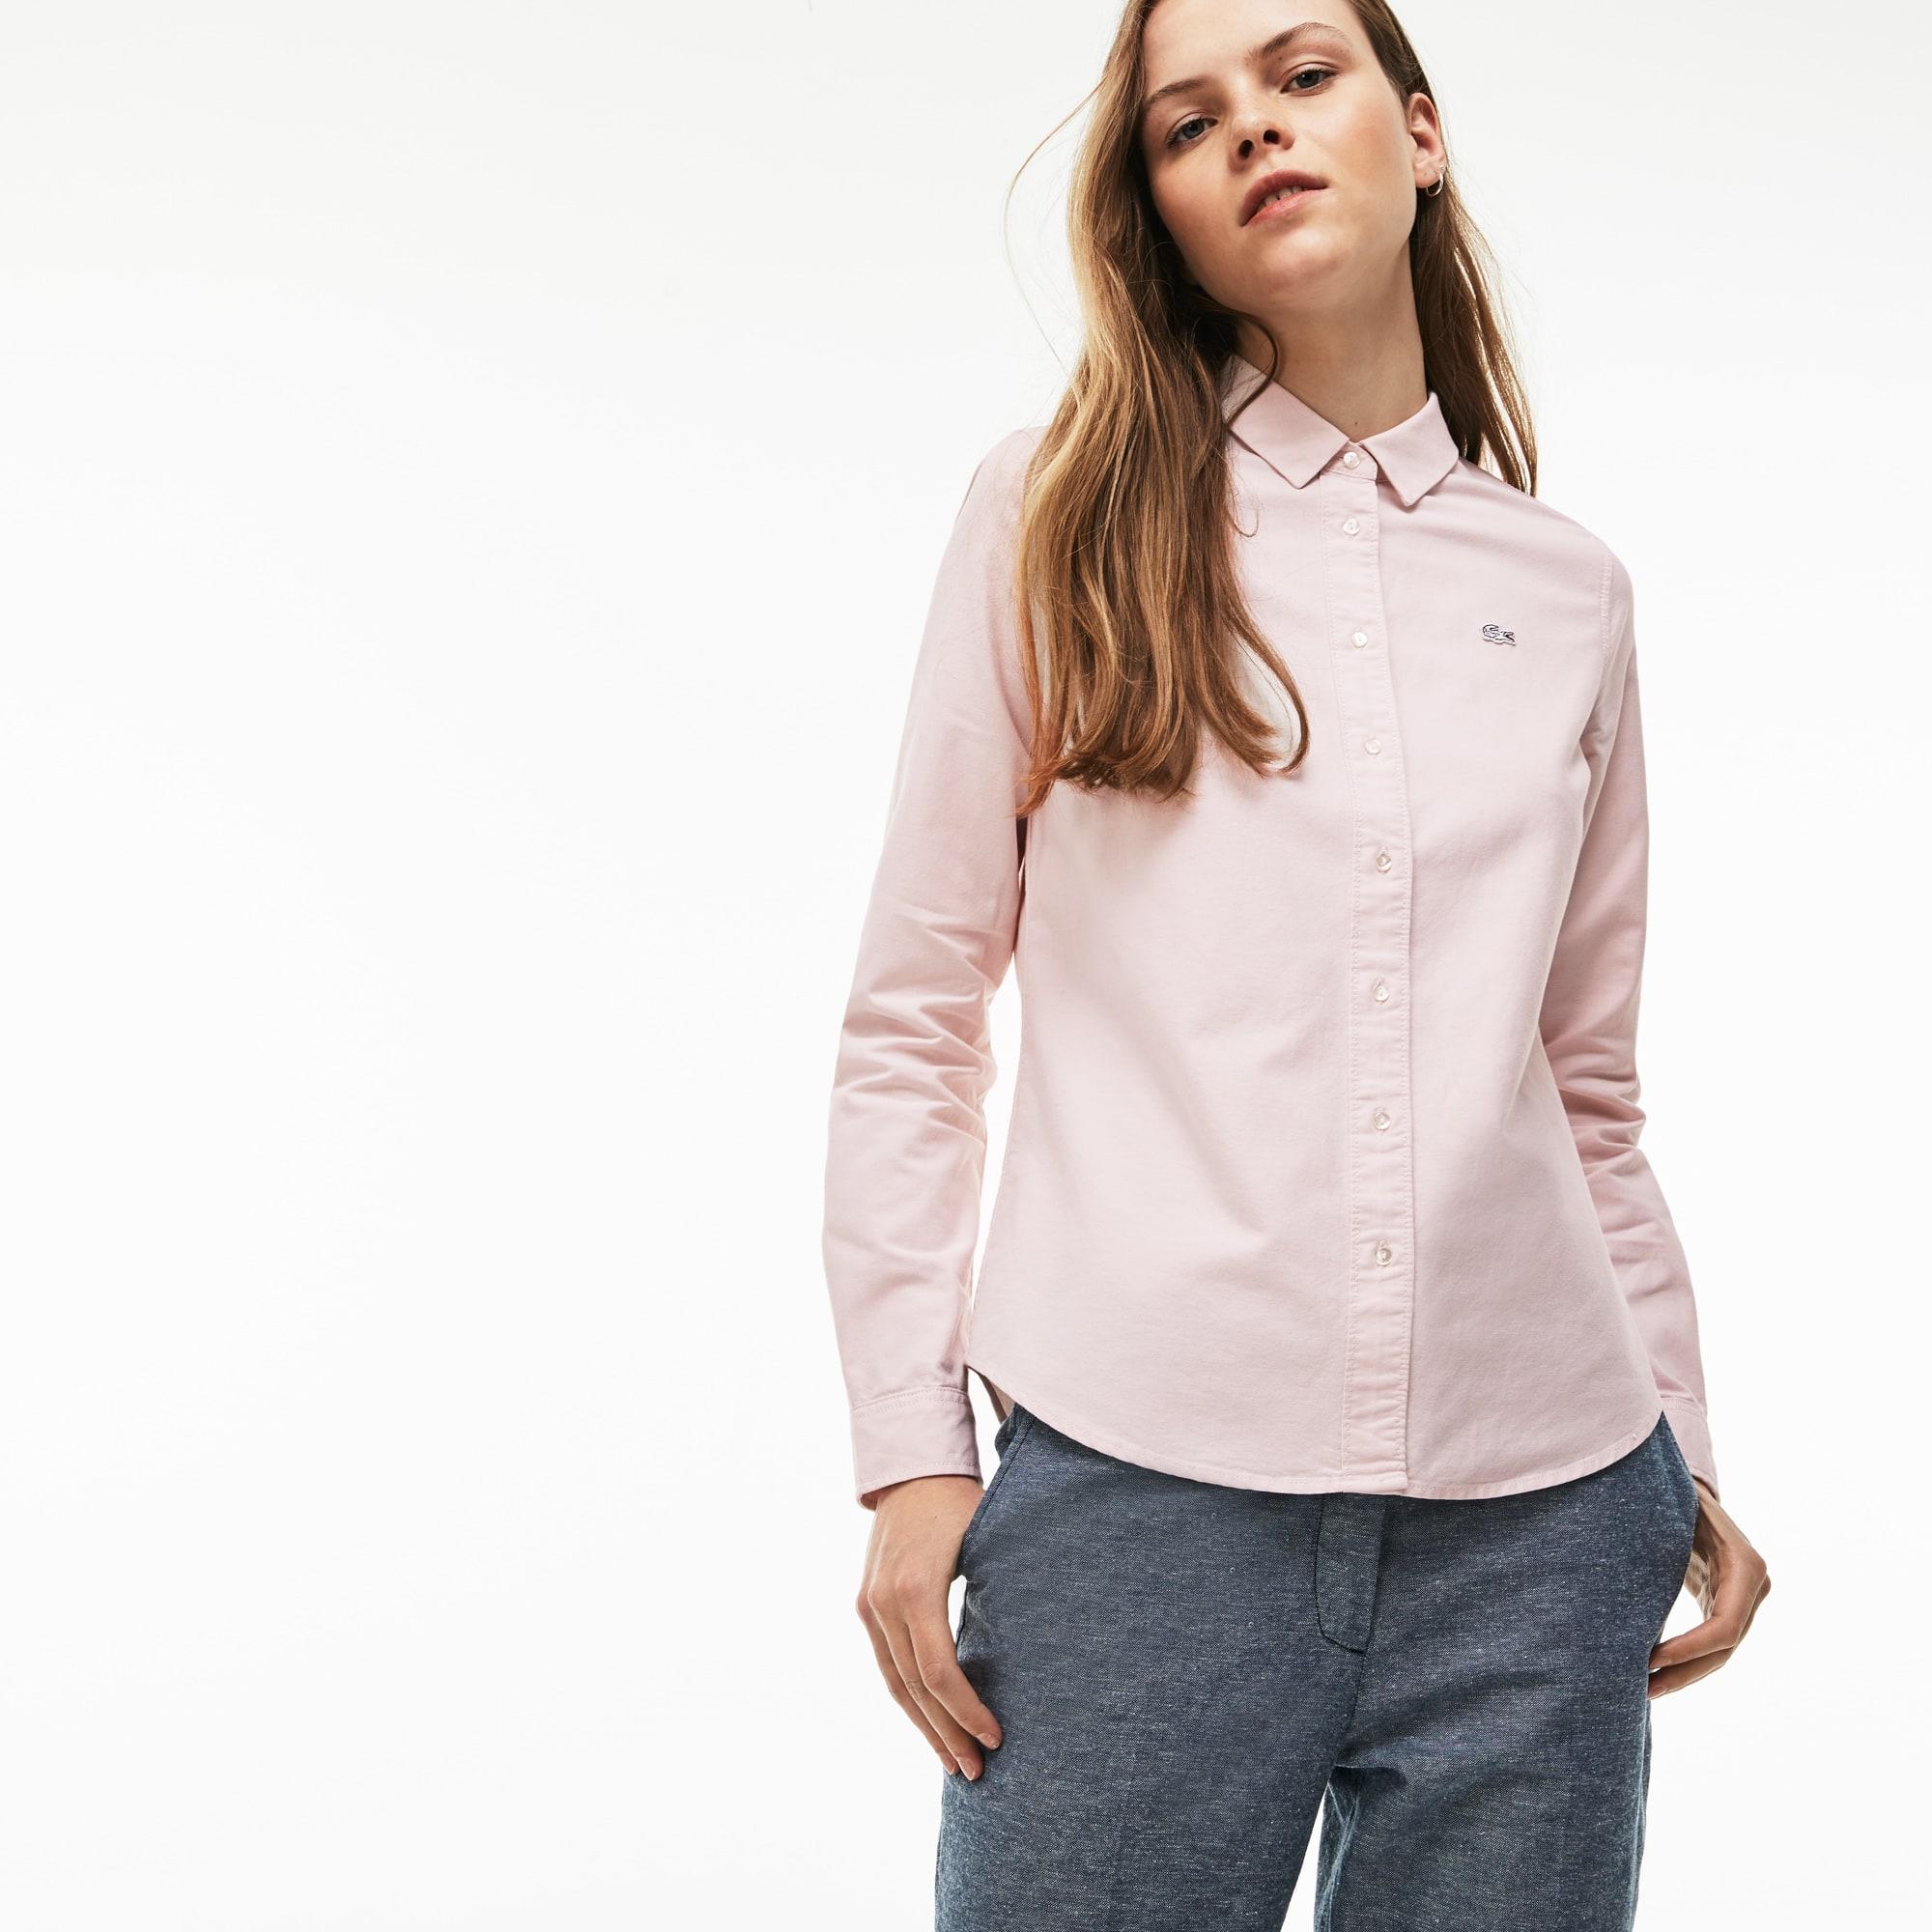 eba92dfa56 Women's Lacoste LIVE Slim Fit Oxford Cotton Shirt